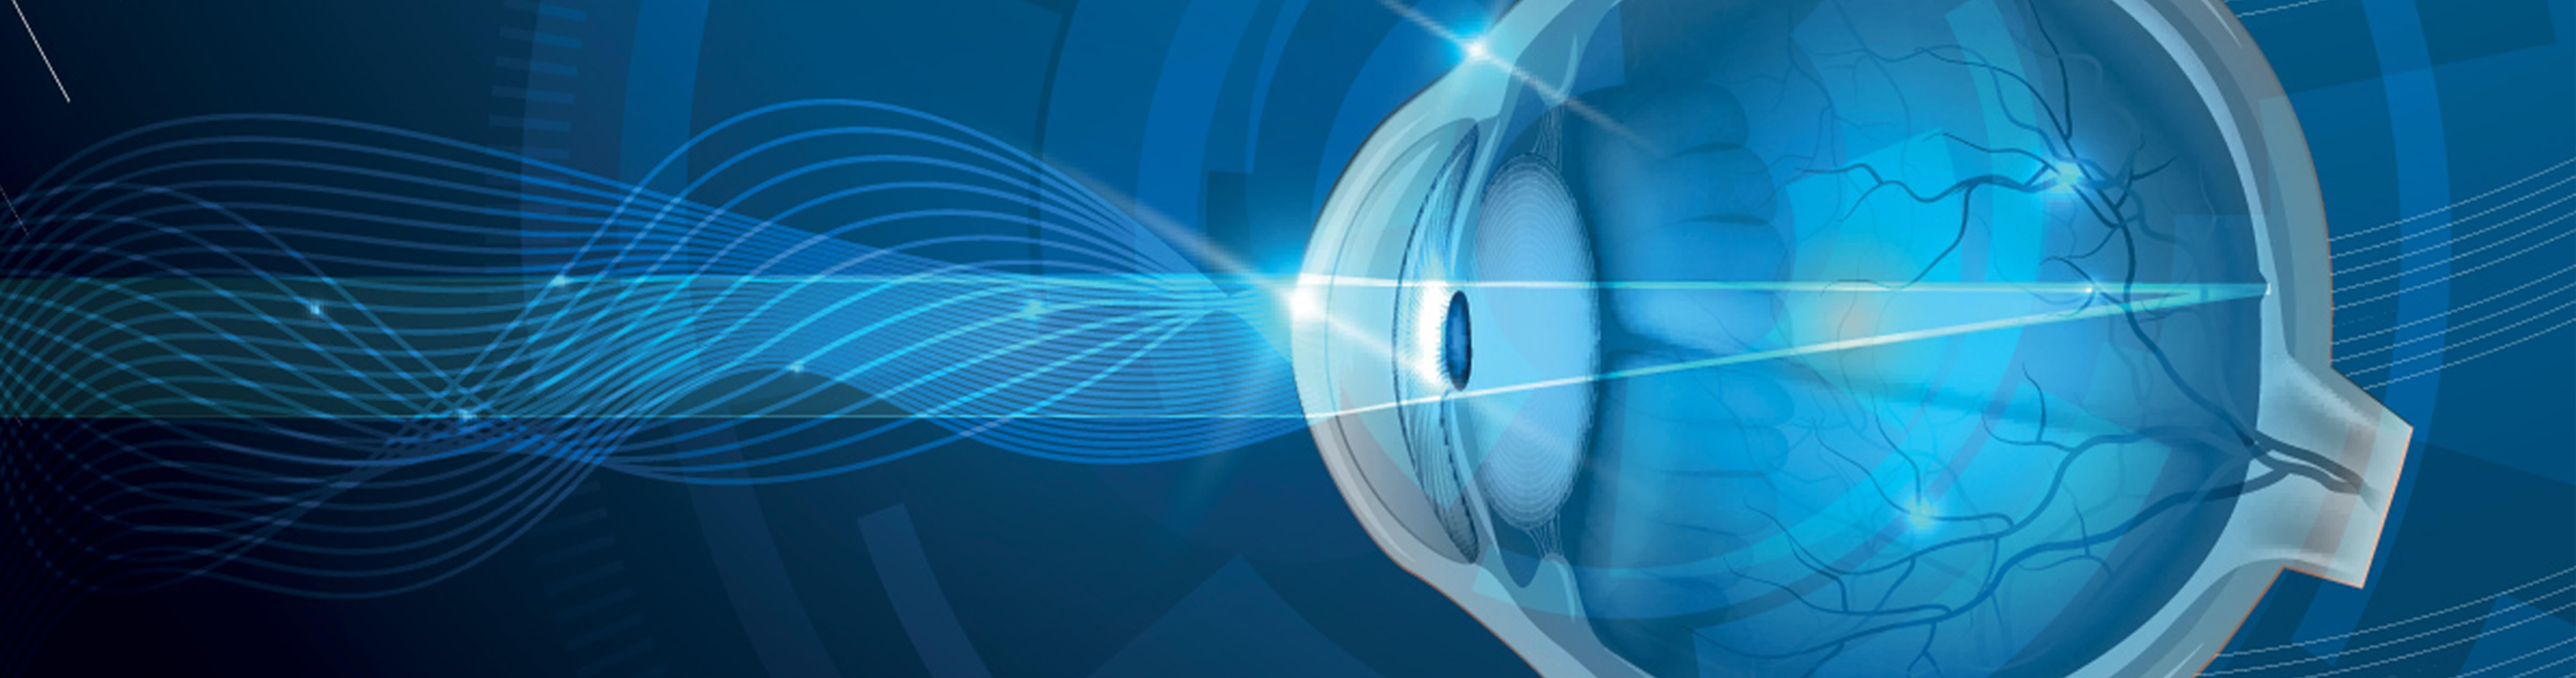 cristalino del ojo